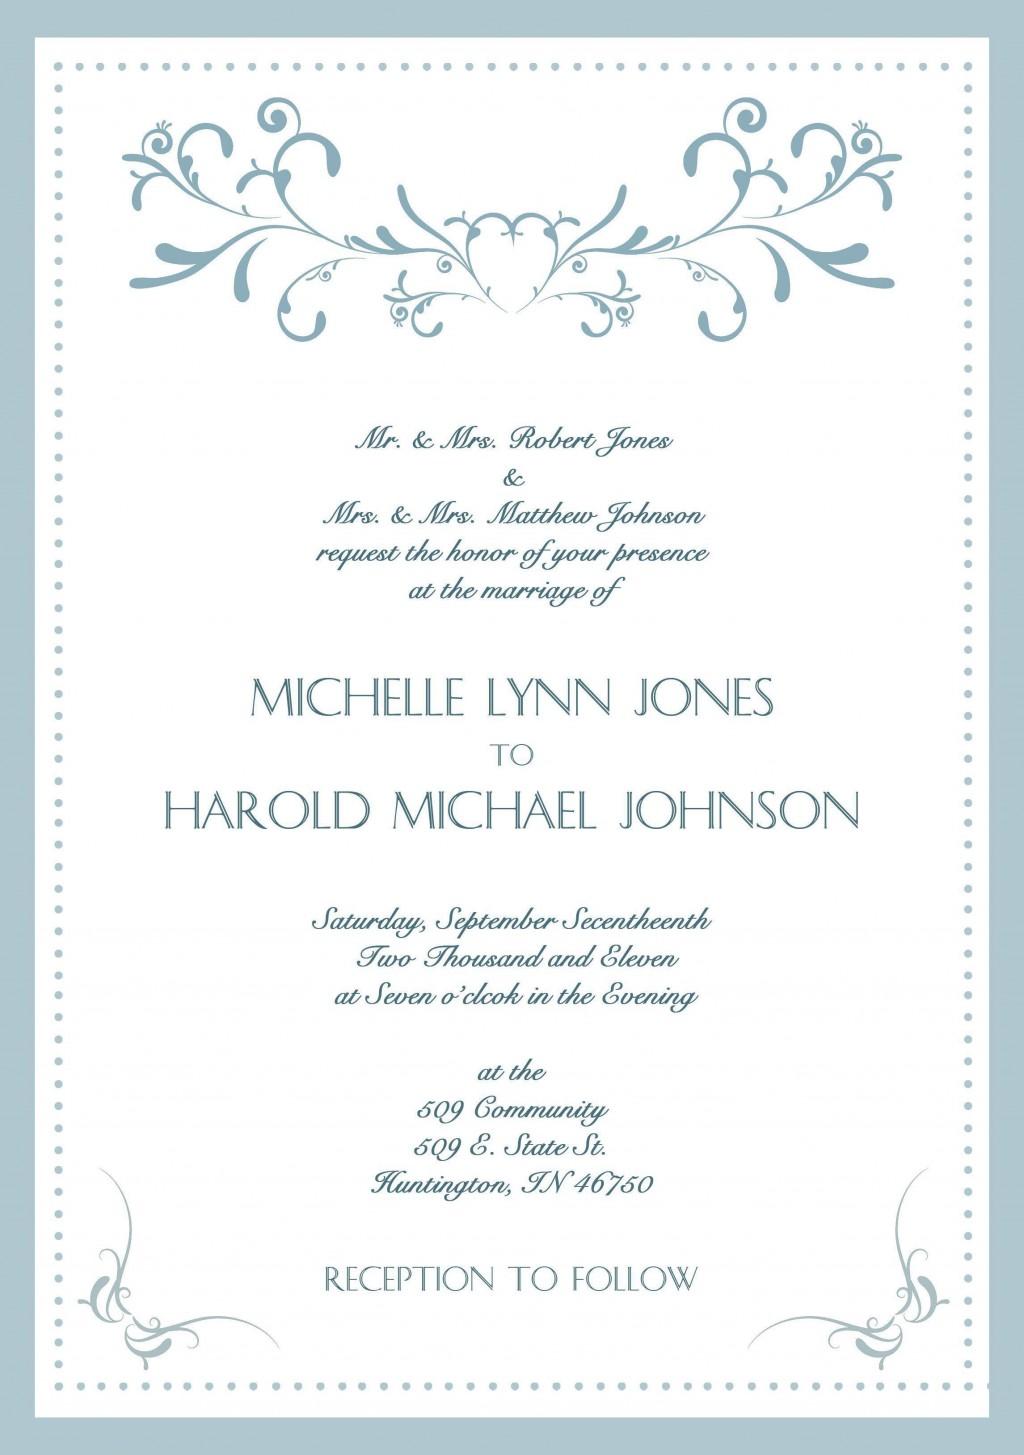 000 Dreaded Sample Wedding Invitation Card Template Photo  Templates Free Design Response WordingLarge